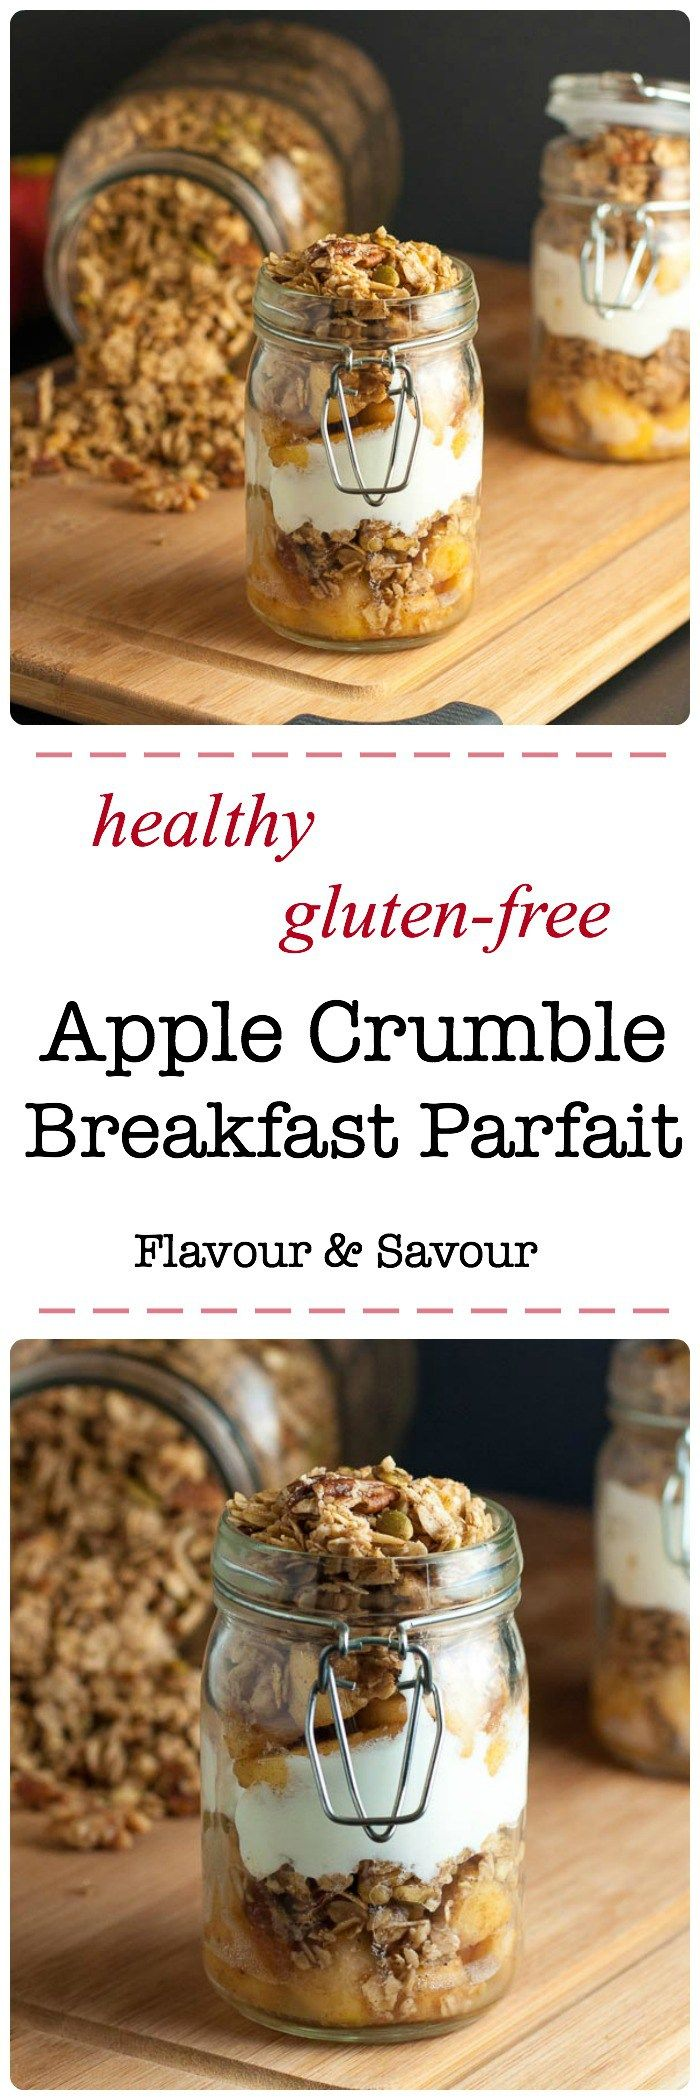 Healthy Gluten-Free Apple Crumble Breakfast Parfait. Pack your breakfast in a jar and feel like you're having dessert! |www.flavourandsavour.com